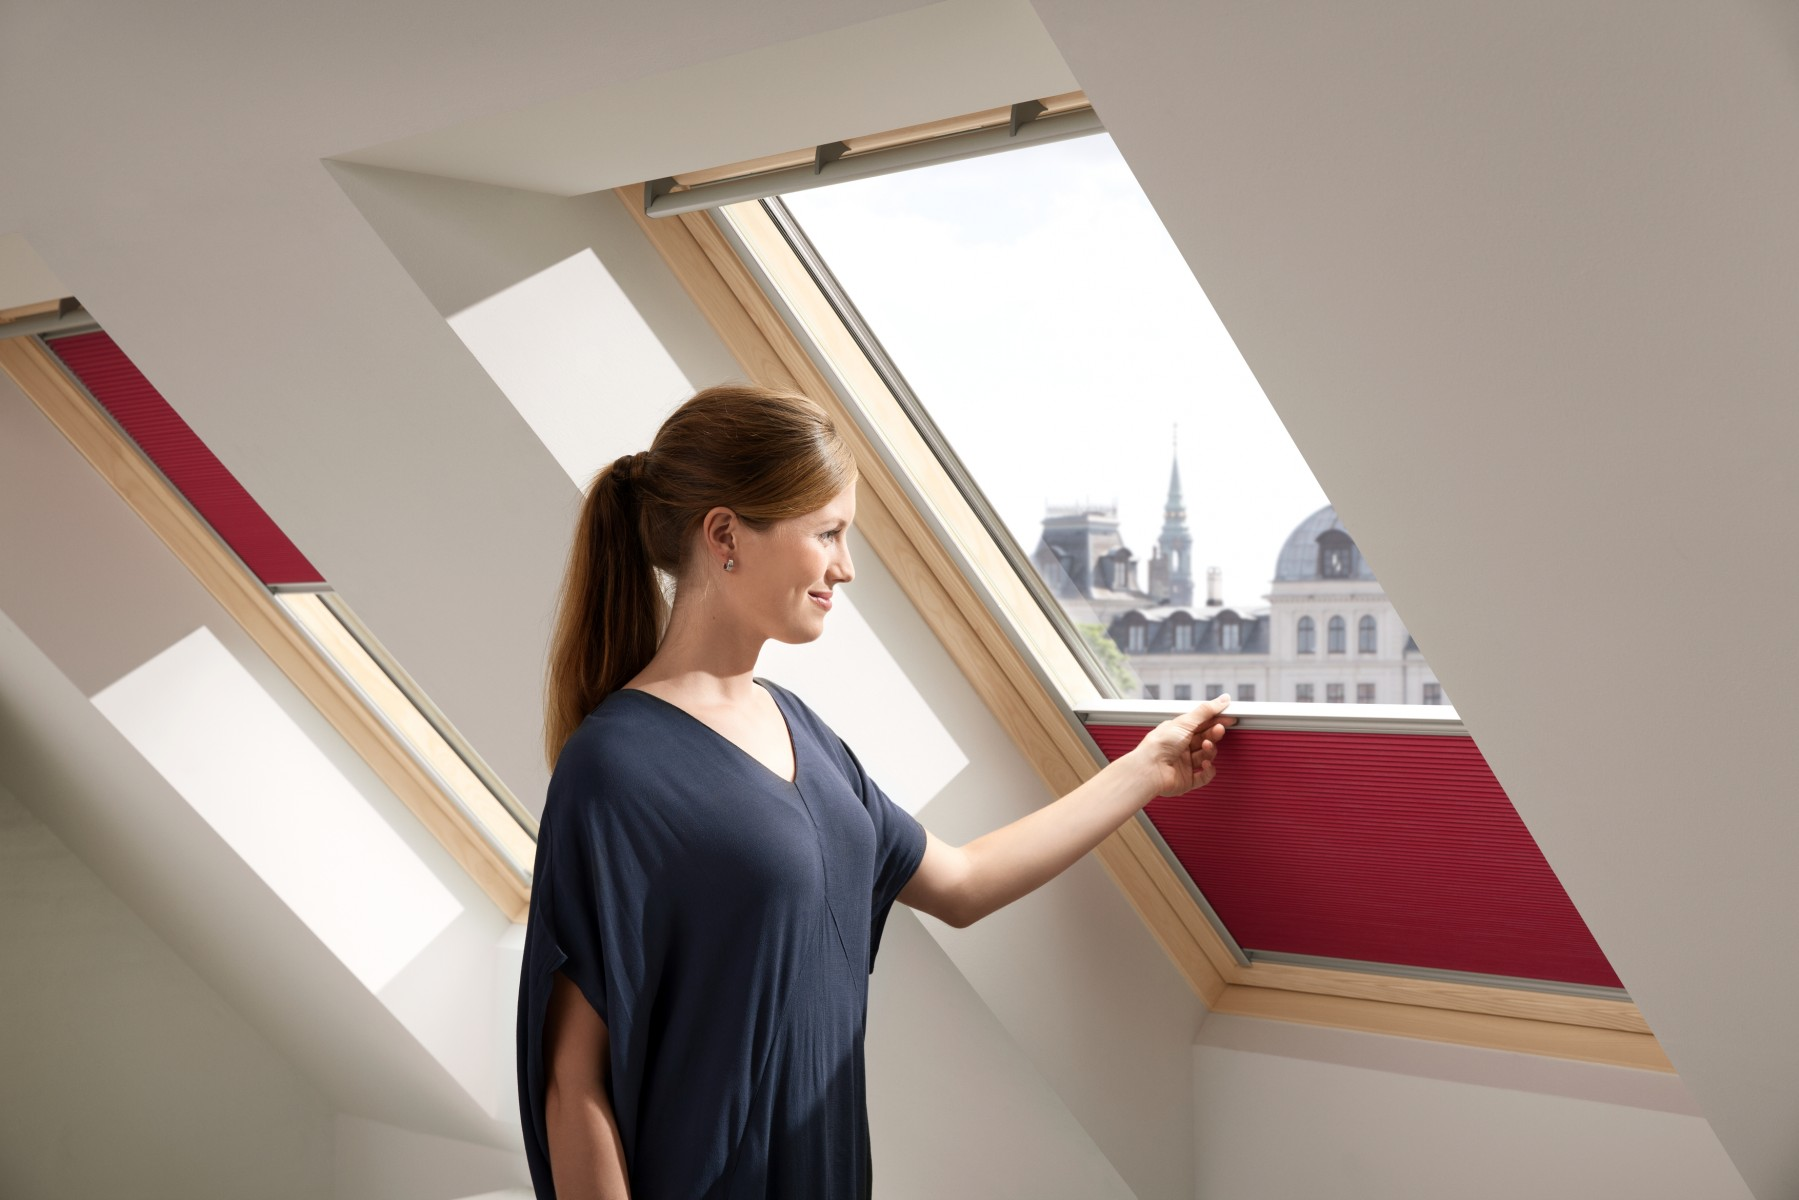 adopter le mode cocooning avec le nouveau store pliss occultant et isolant velux. Black Bedroom Furniture Sets. Home Design Ideas